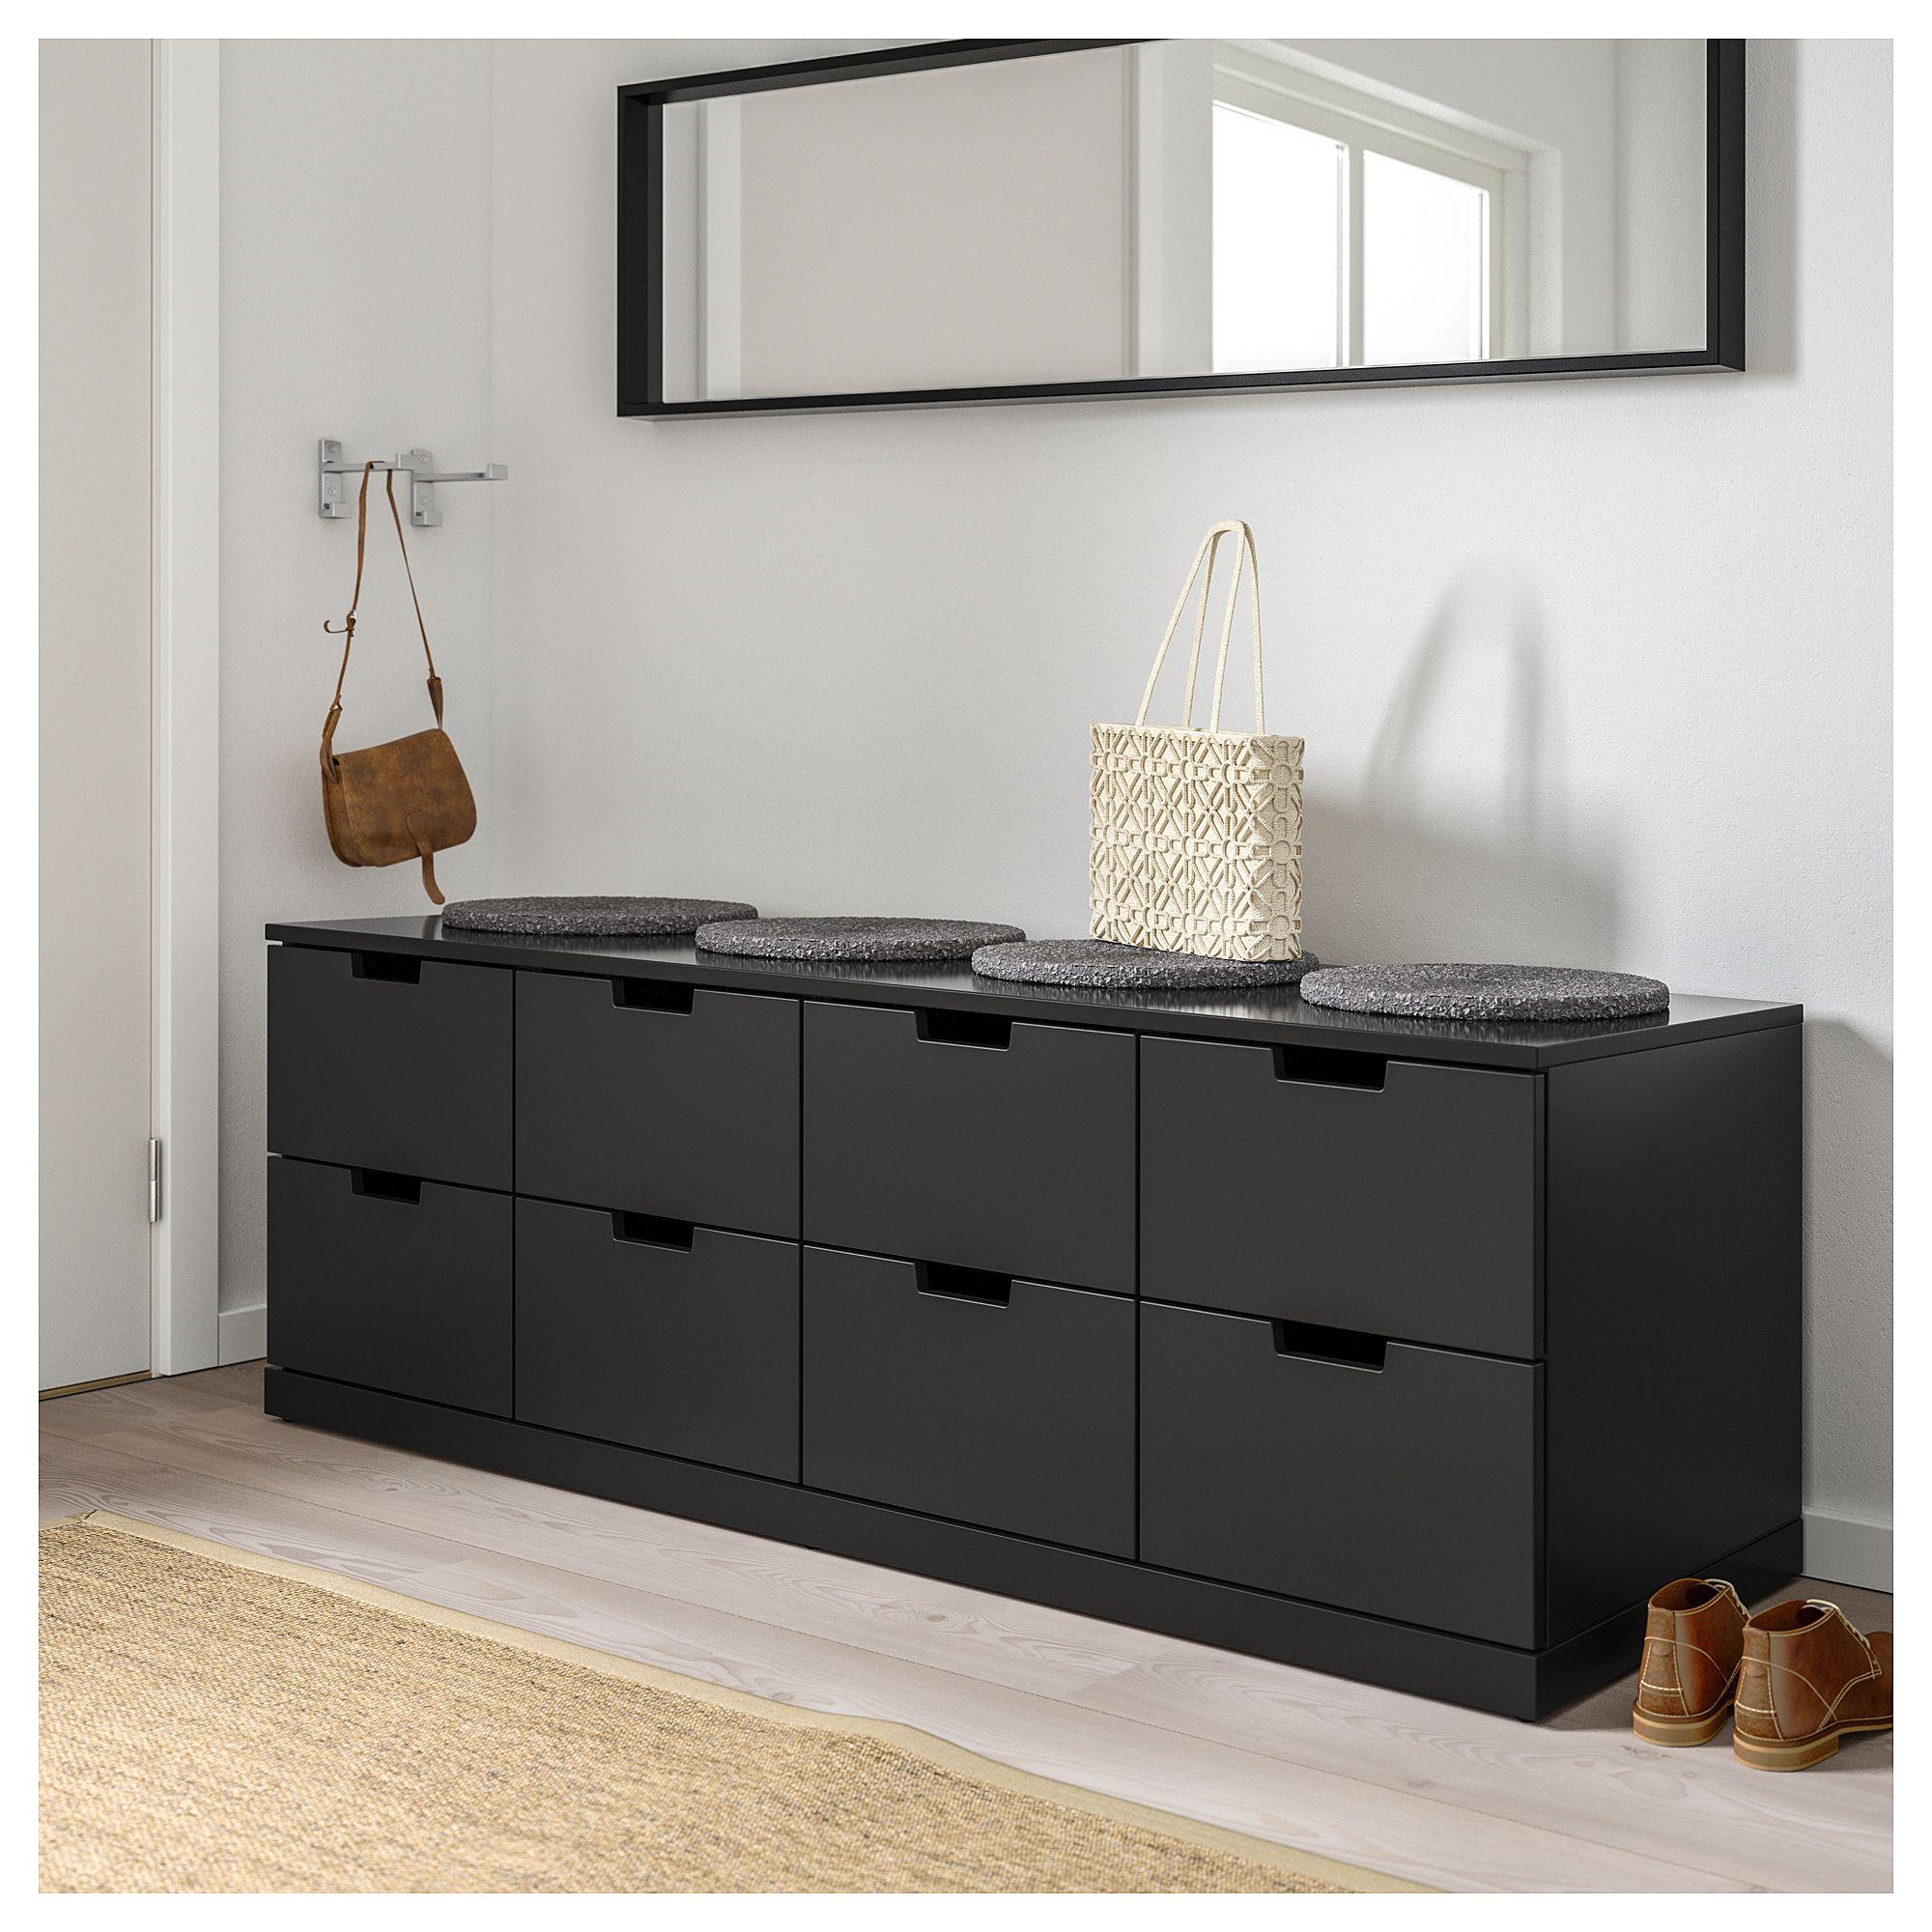 Ikea Nordli Anthracite 8 Drawer Dresser In 2019 8 Drawer